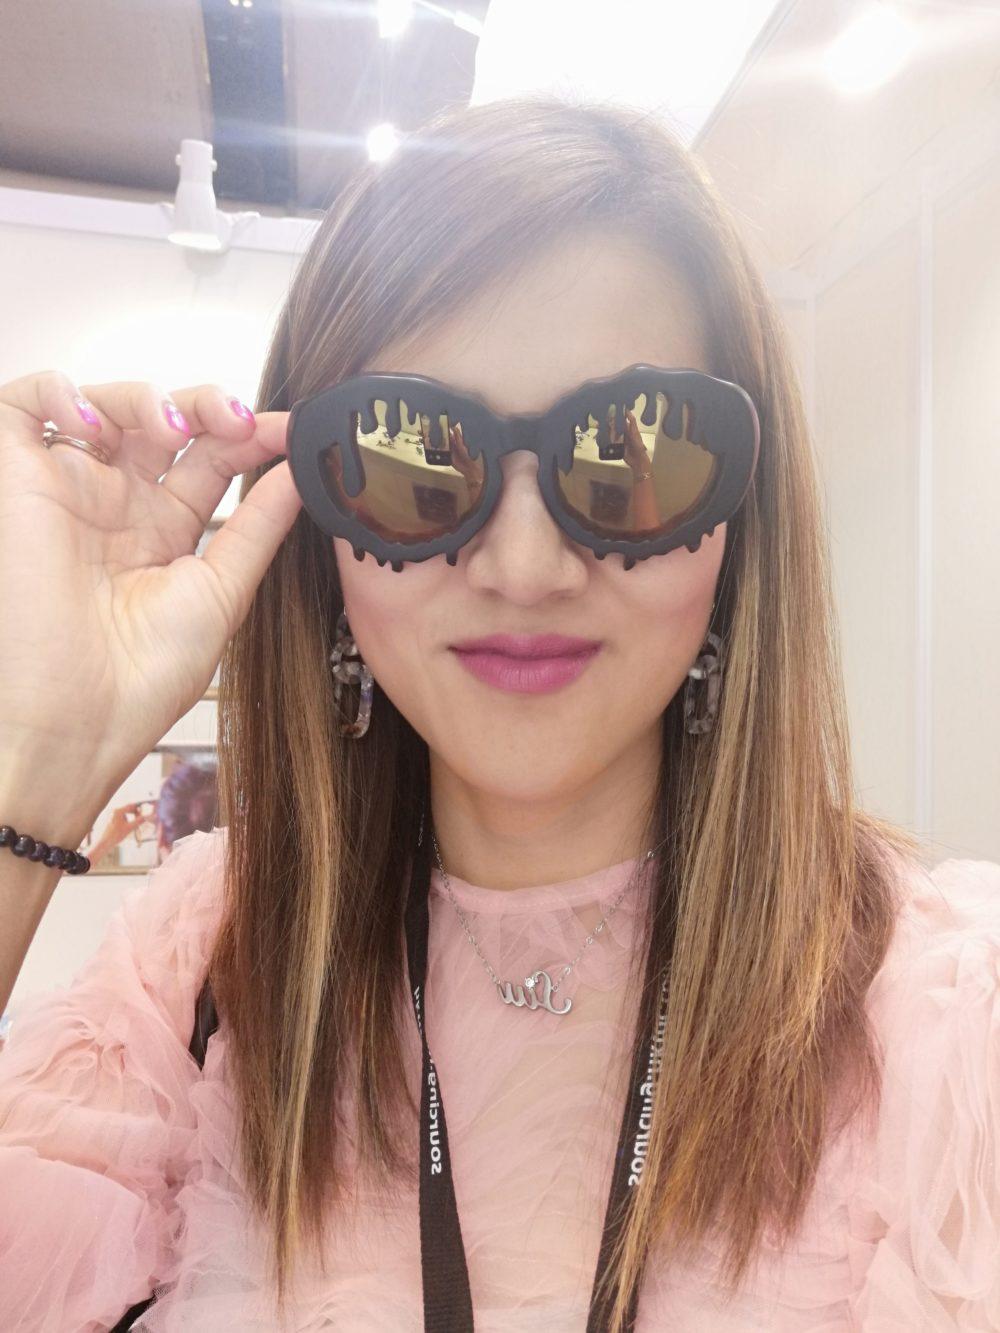 Stoned Eyewear at Hong Kong International Optical Fair 2019